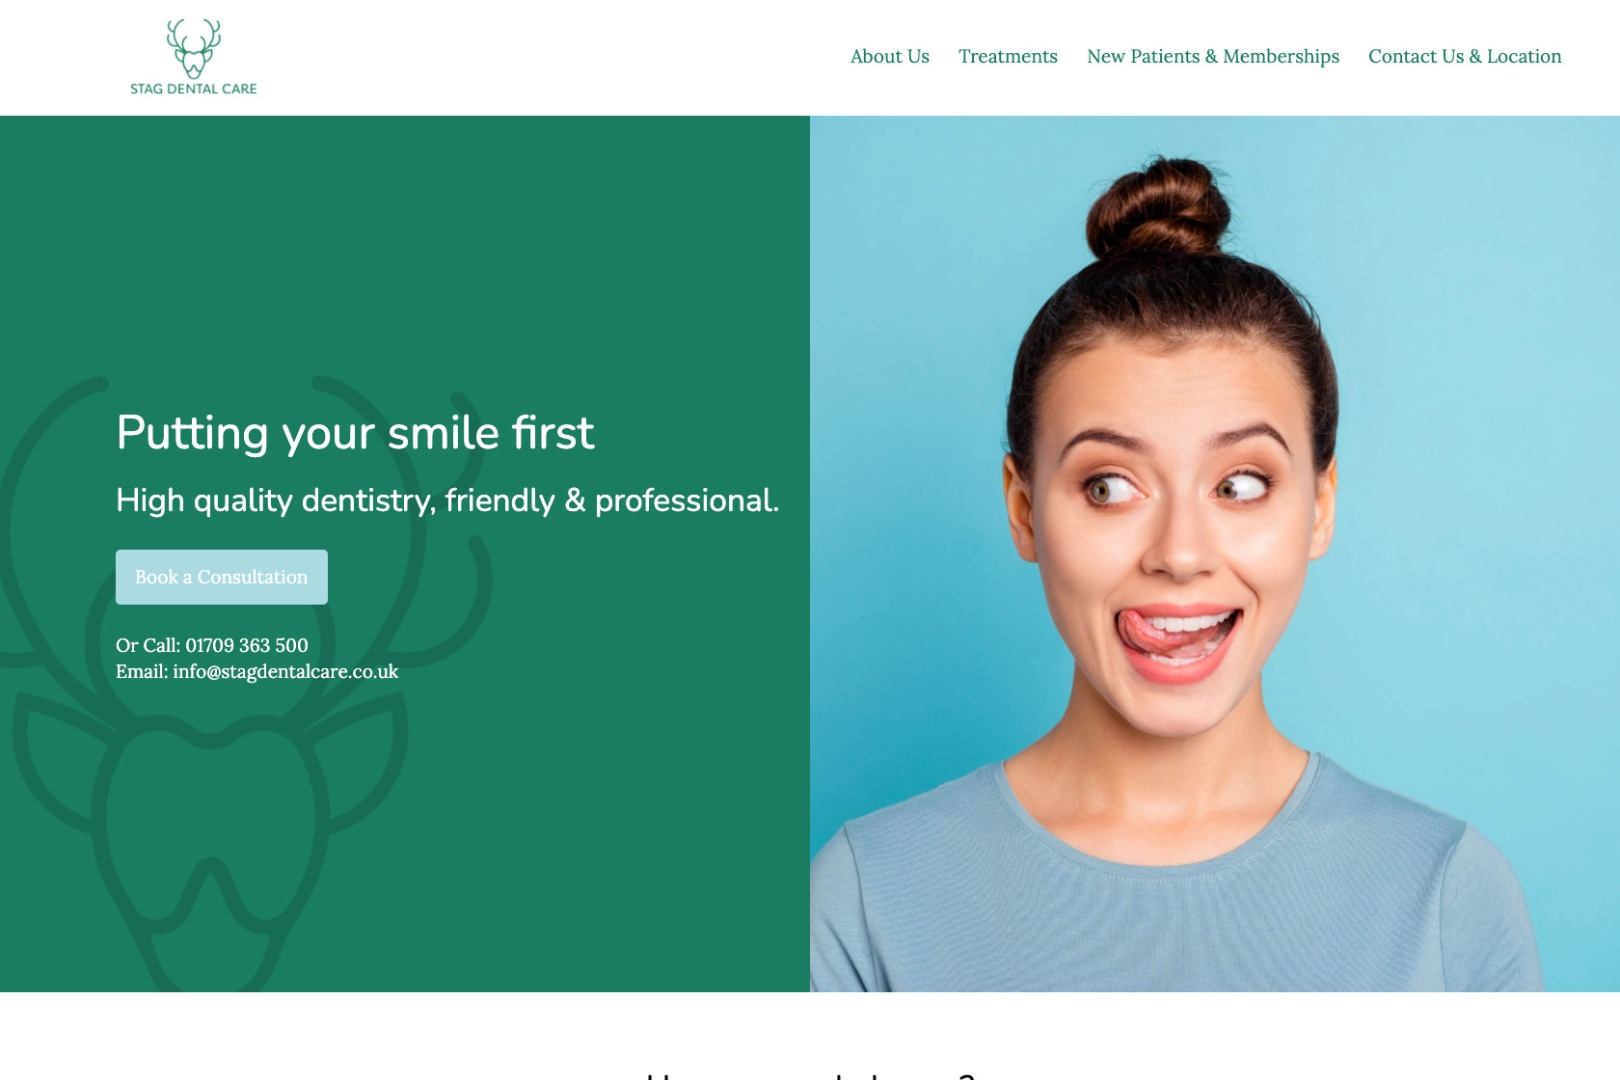 stag dental